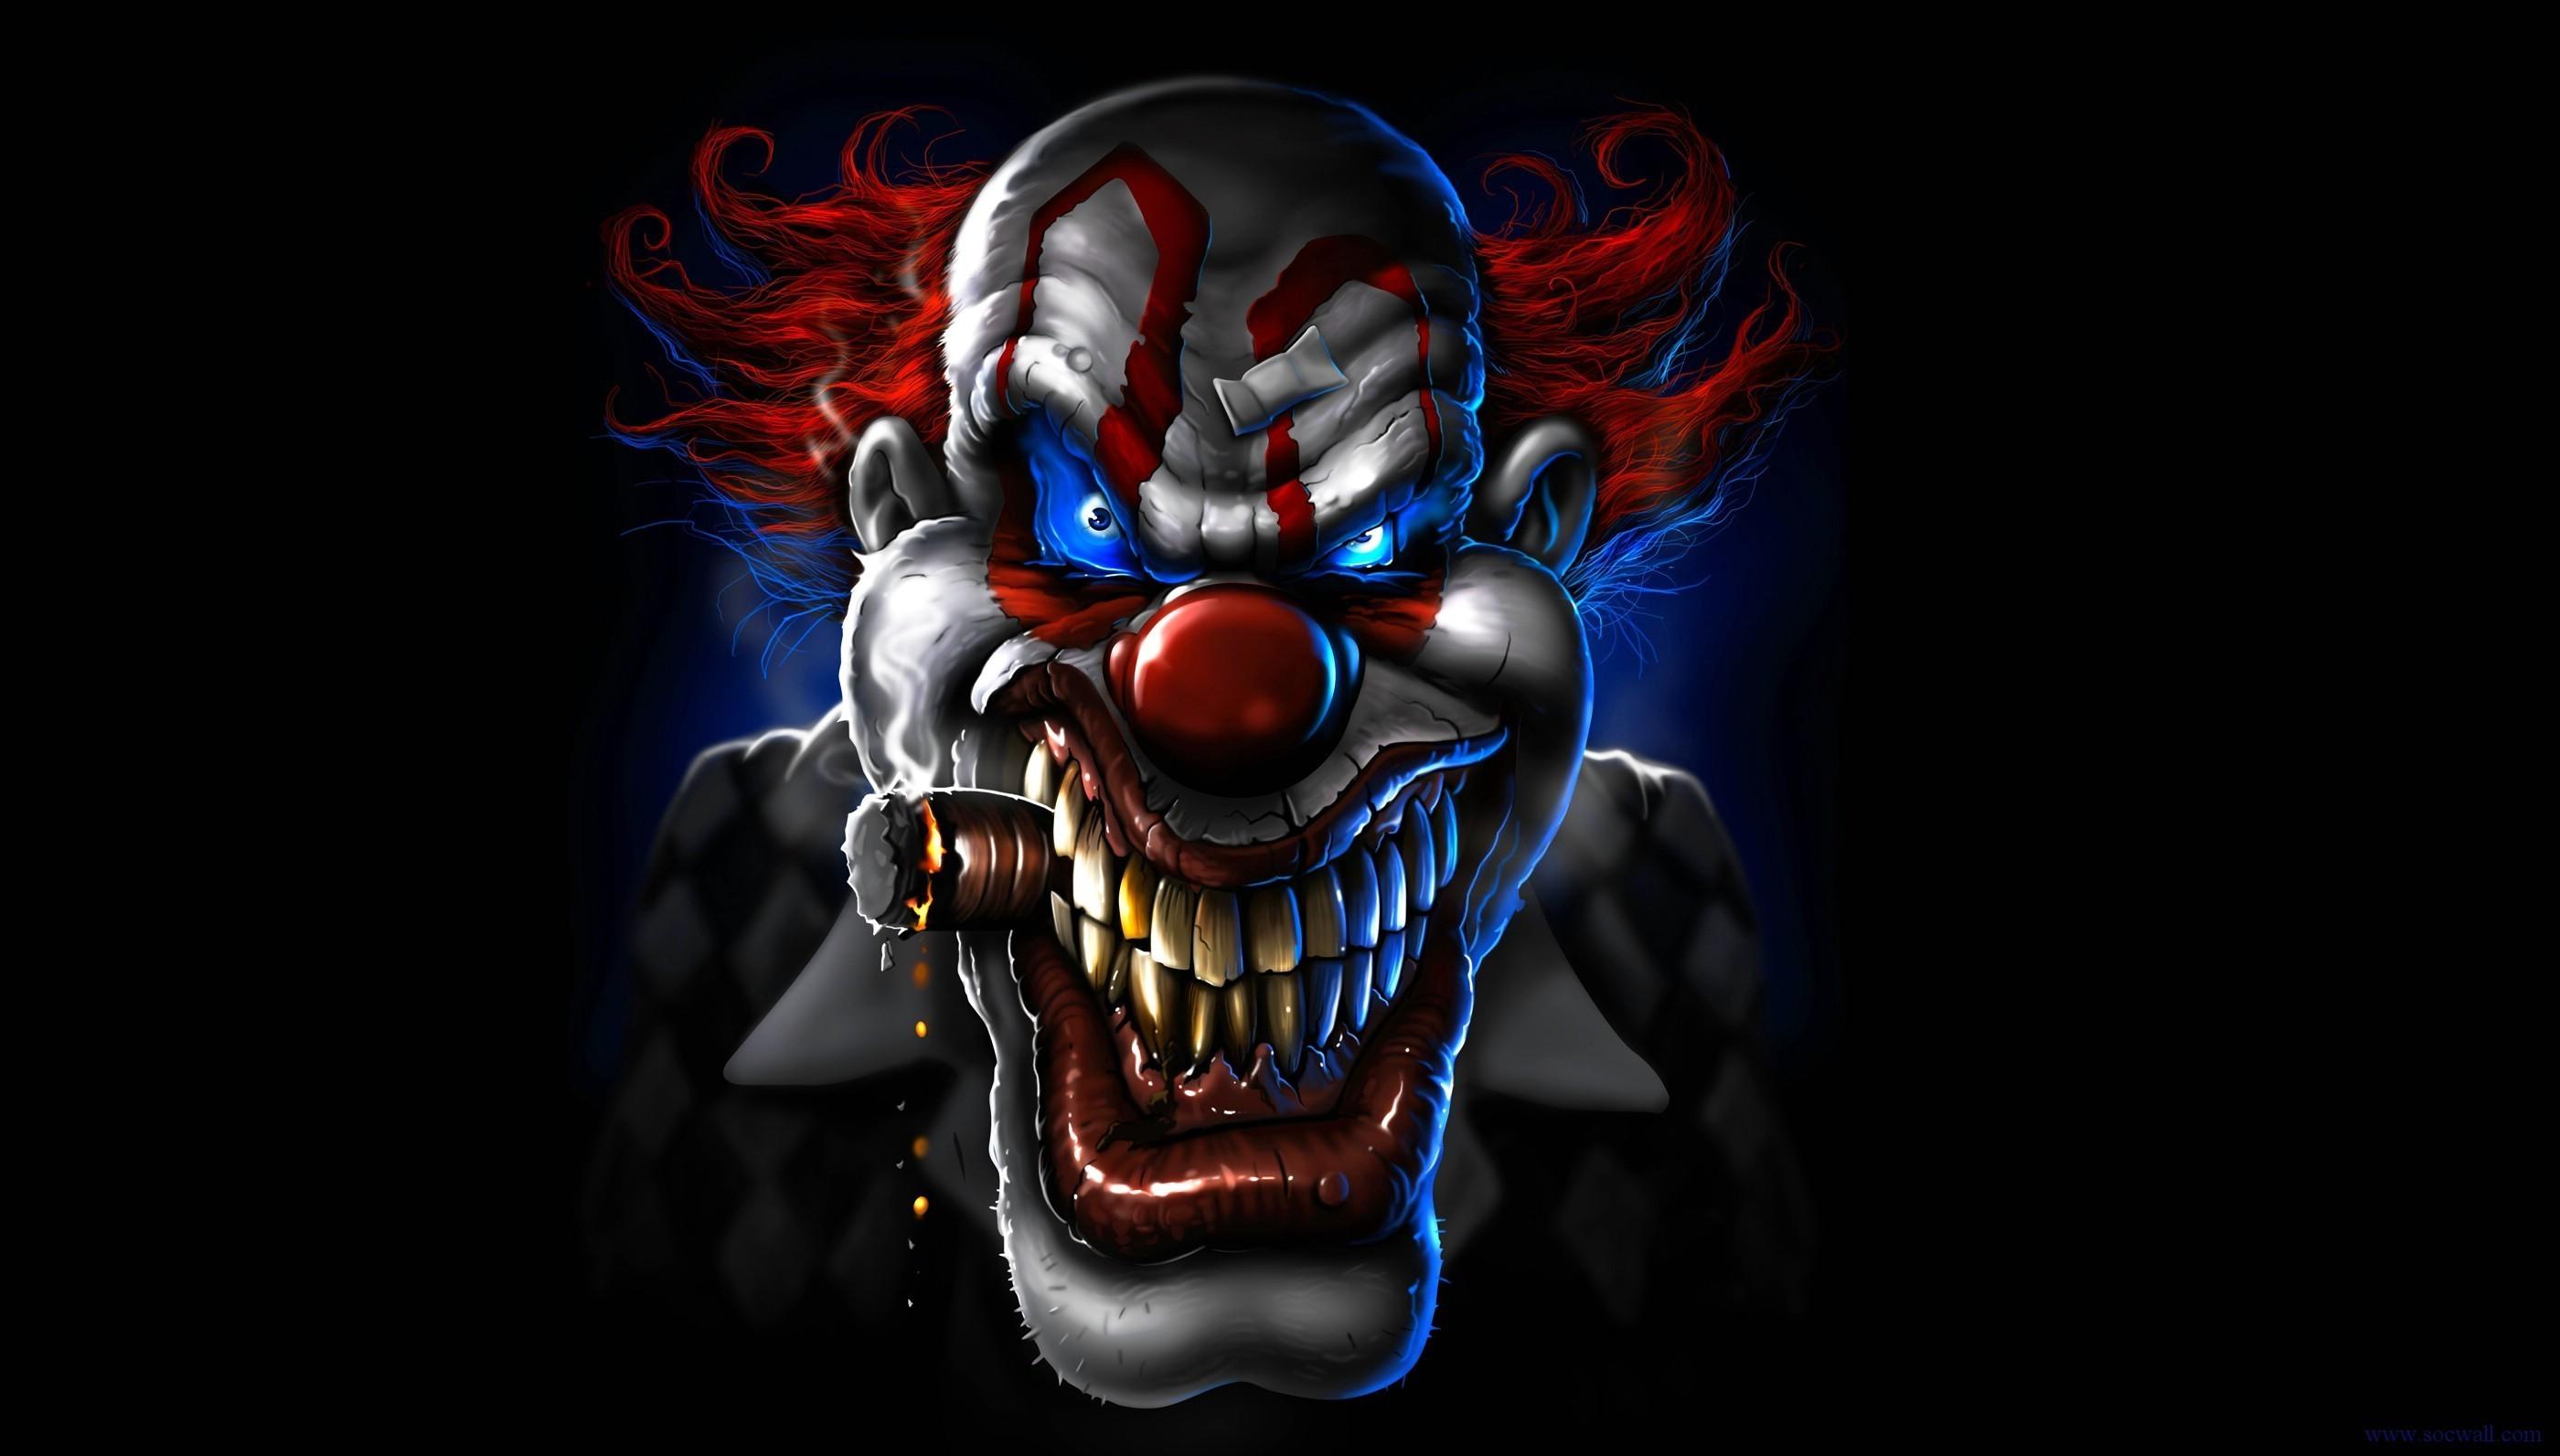 Creepy clown wallpaper wallpapertag - Circus joker wallpaper ...